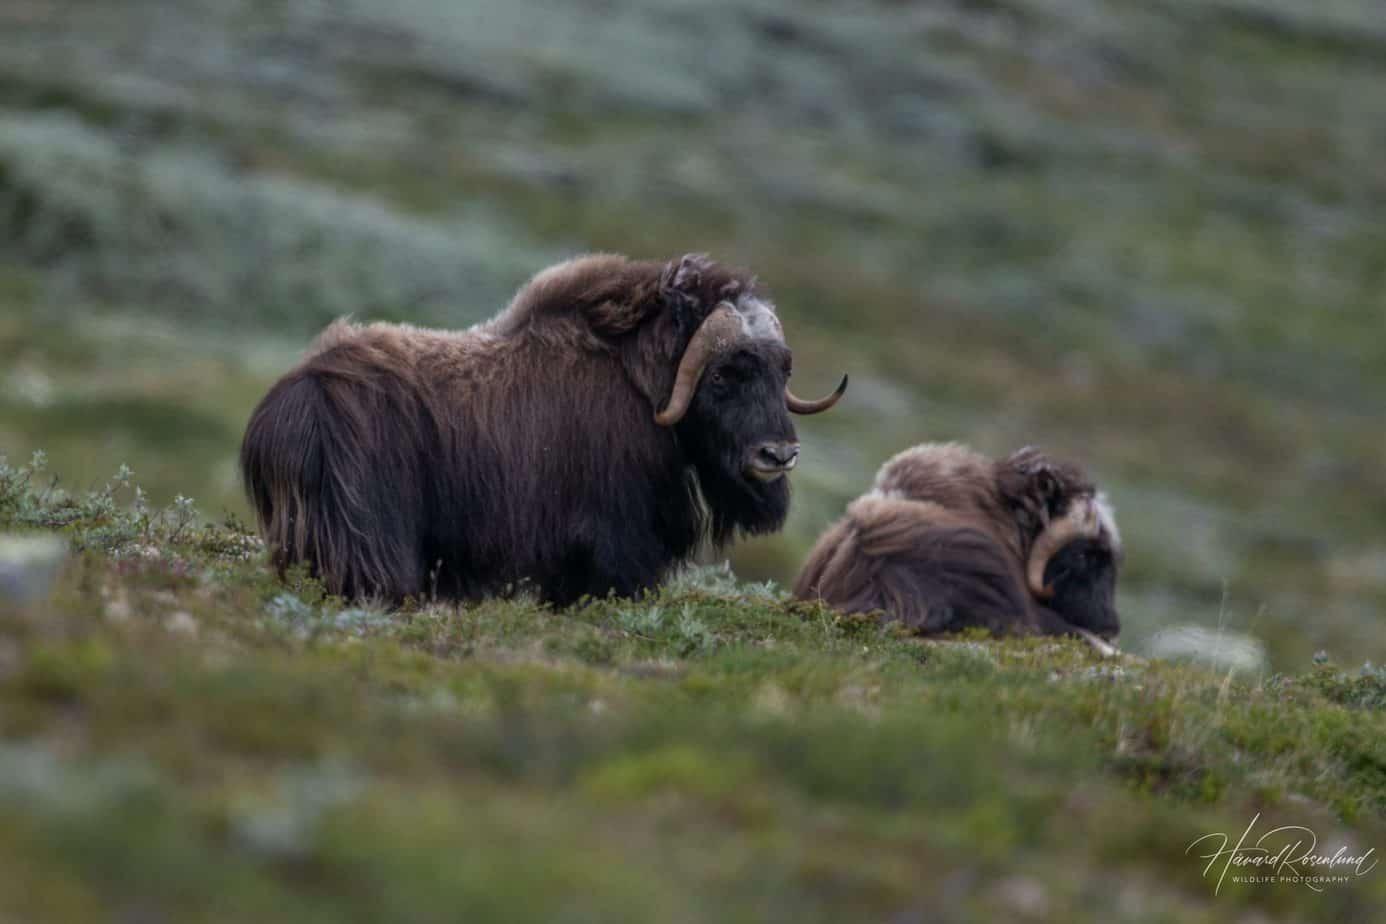 Muskox @ Dovrefjell-Sunndalsfjella National Park. Photo: Håvard Rosenlund